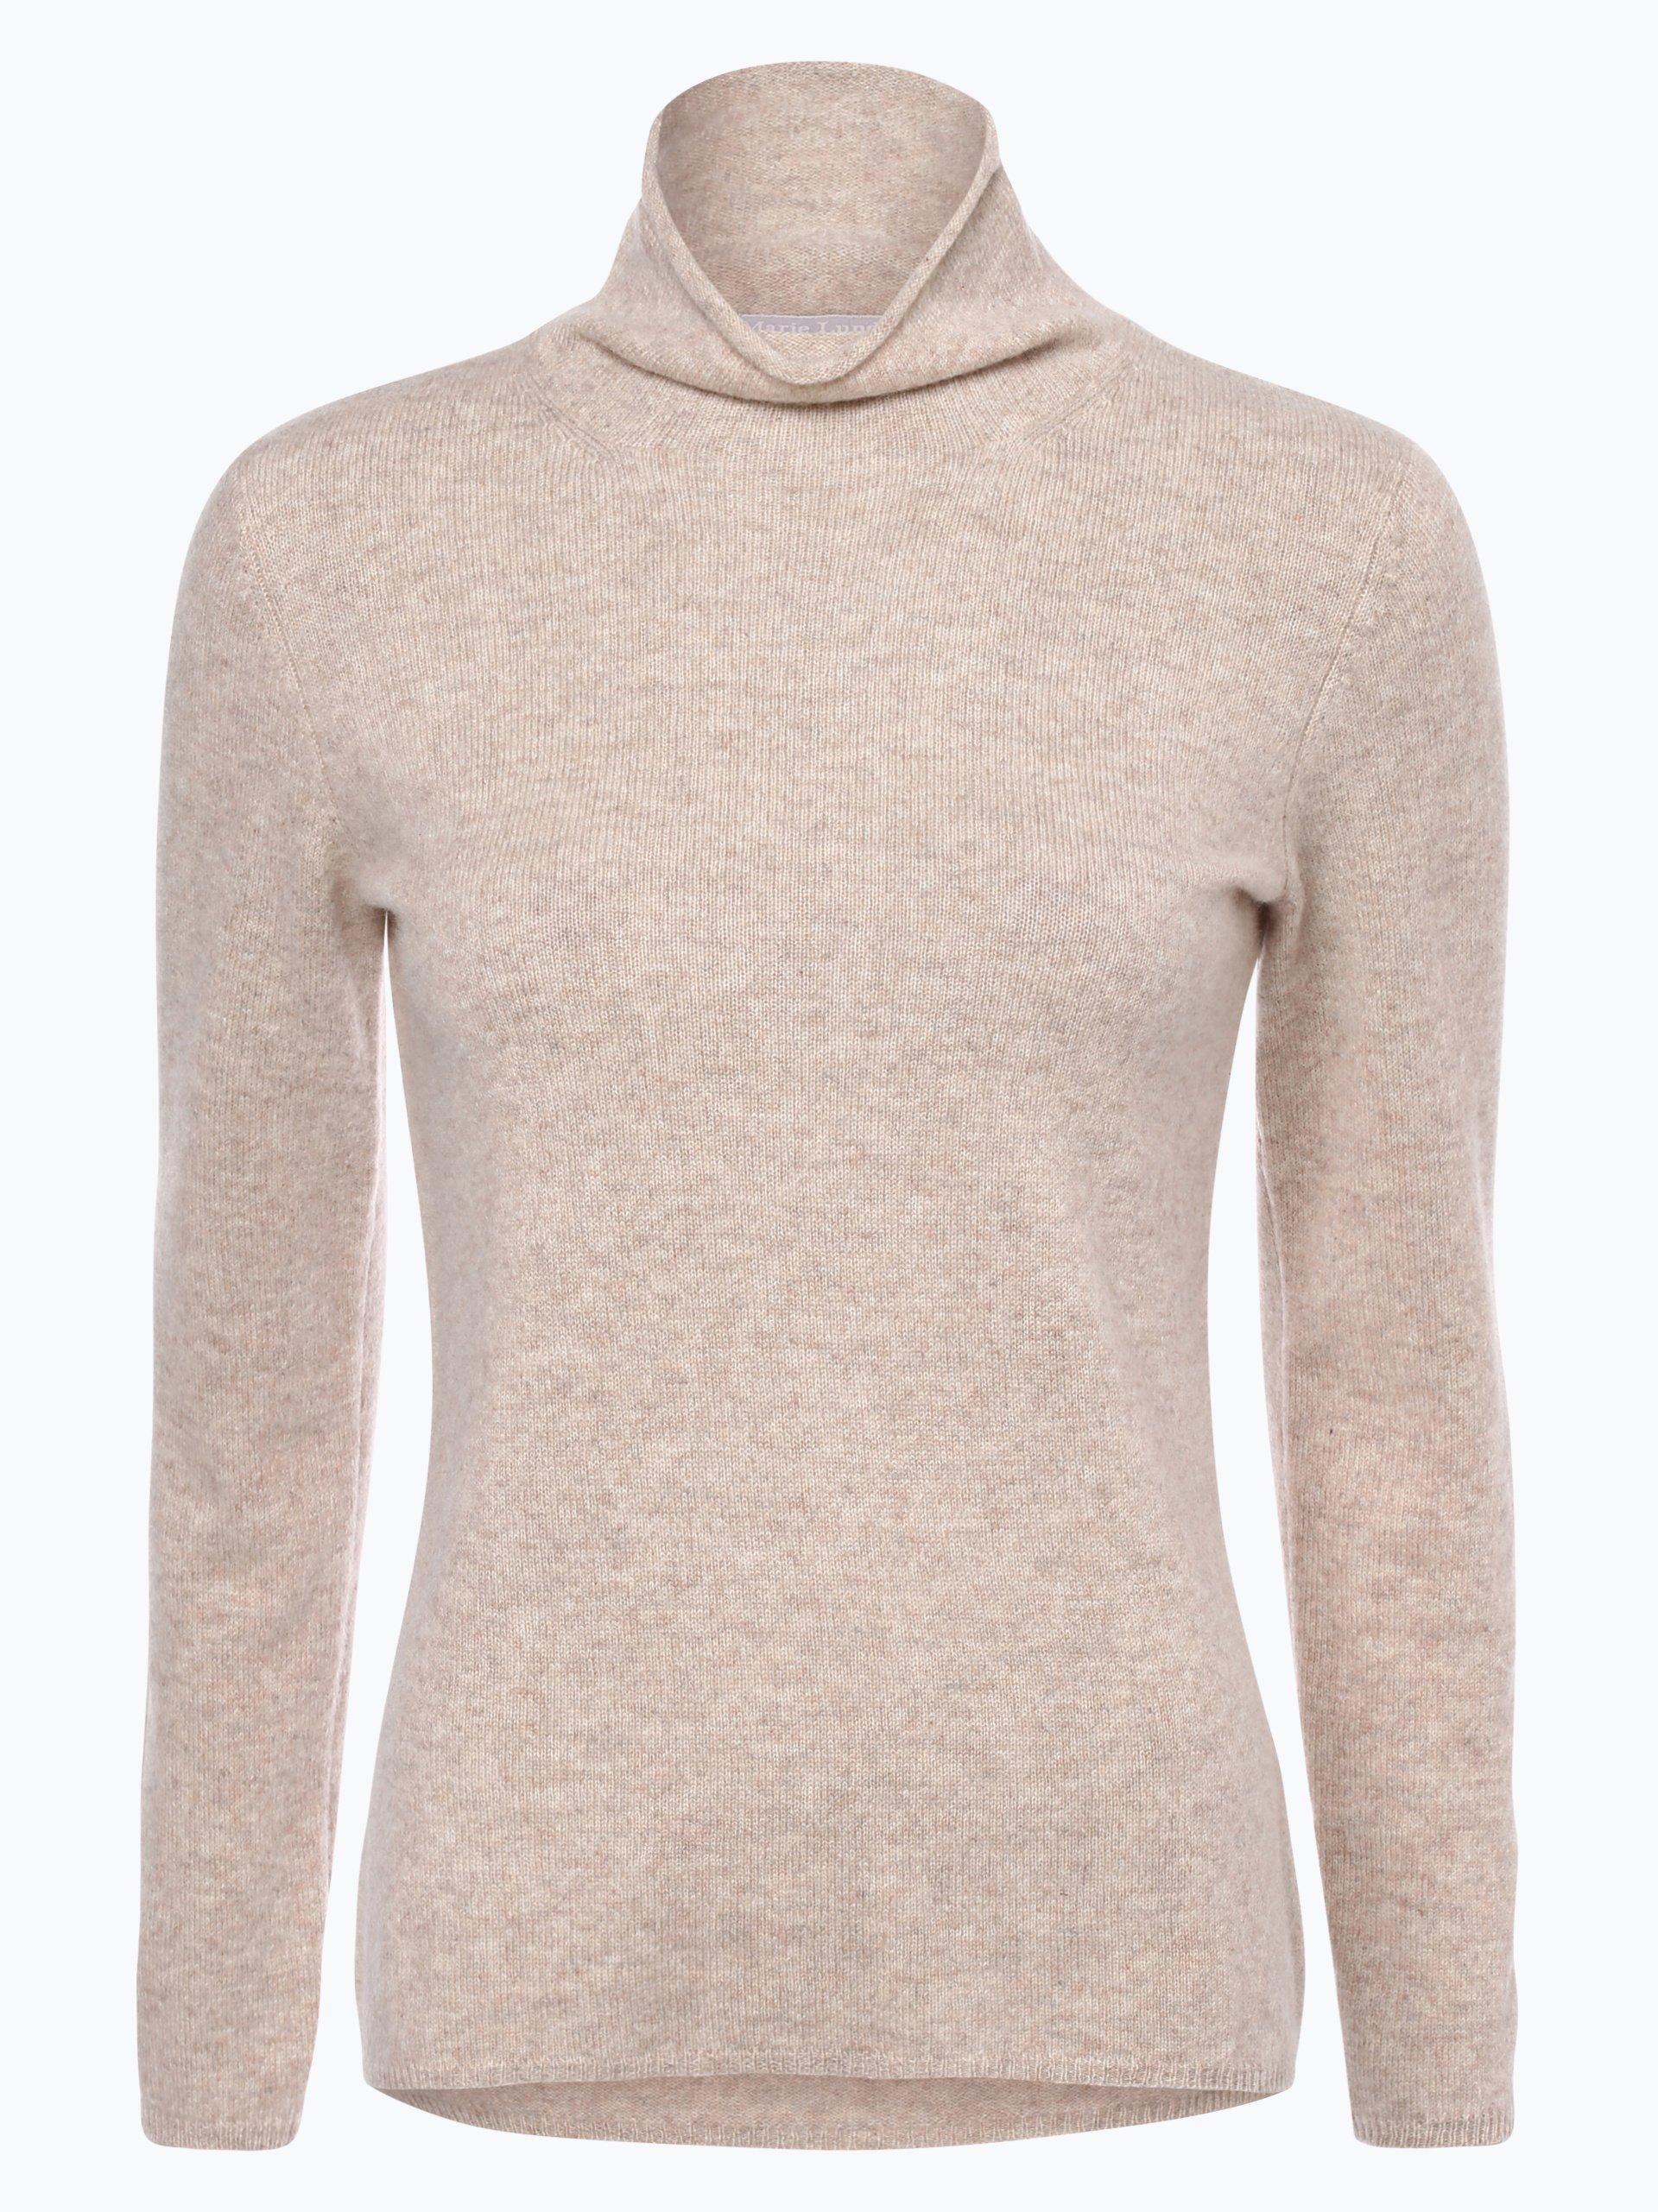 marie lund damen pure cashmere pullover beige uni online kaufen vangraaf com. Black Bedroom Furniture Sets. Home Design Ideas